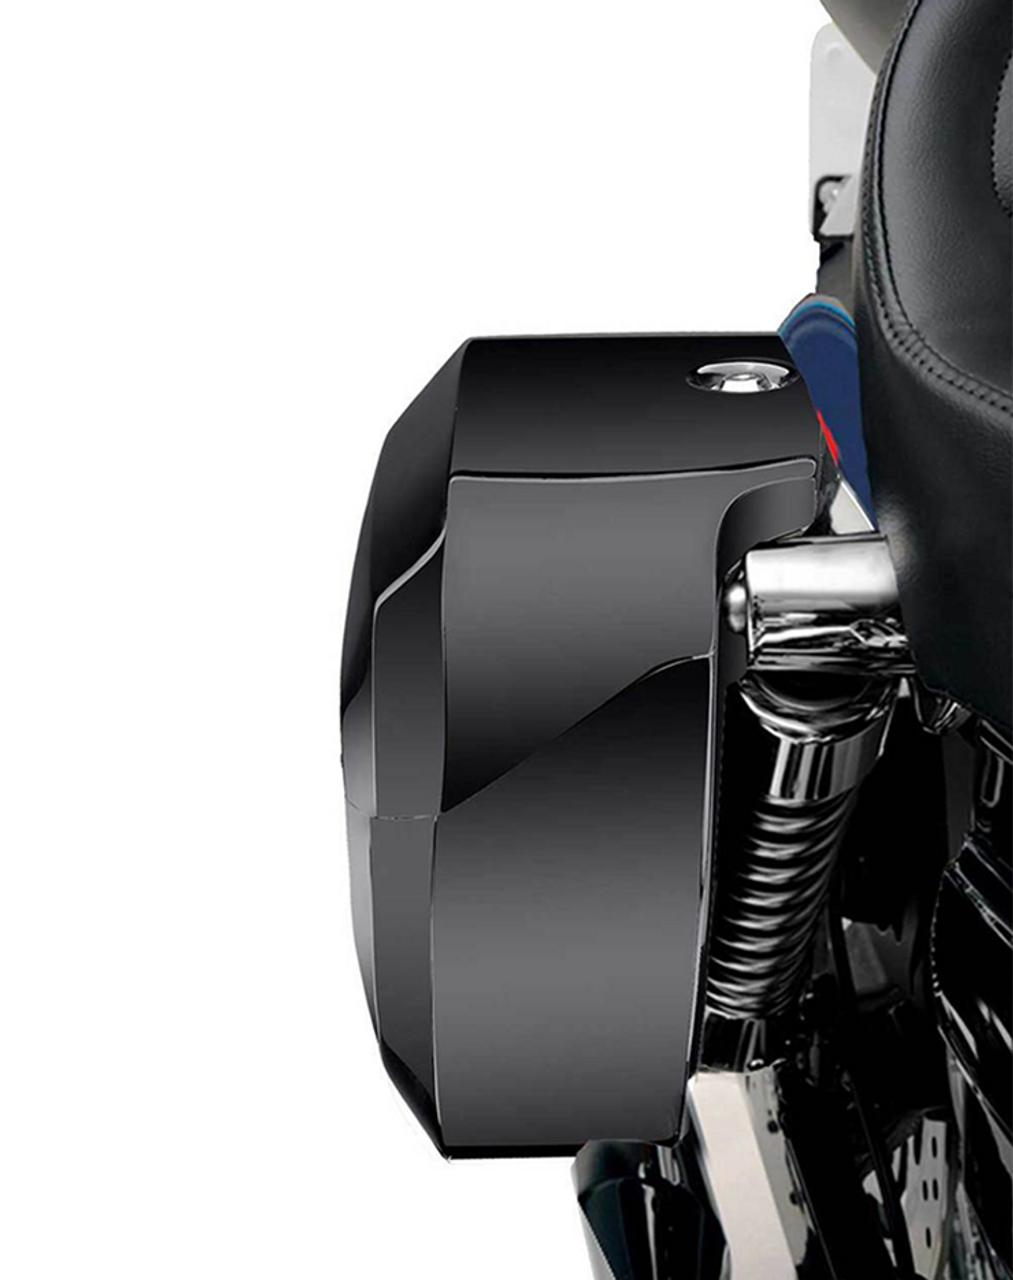 Honda VTX 1800 N Lamellar Extra Large Shock Cutout Saddlebag Shock Cutout View